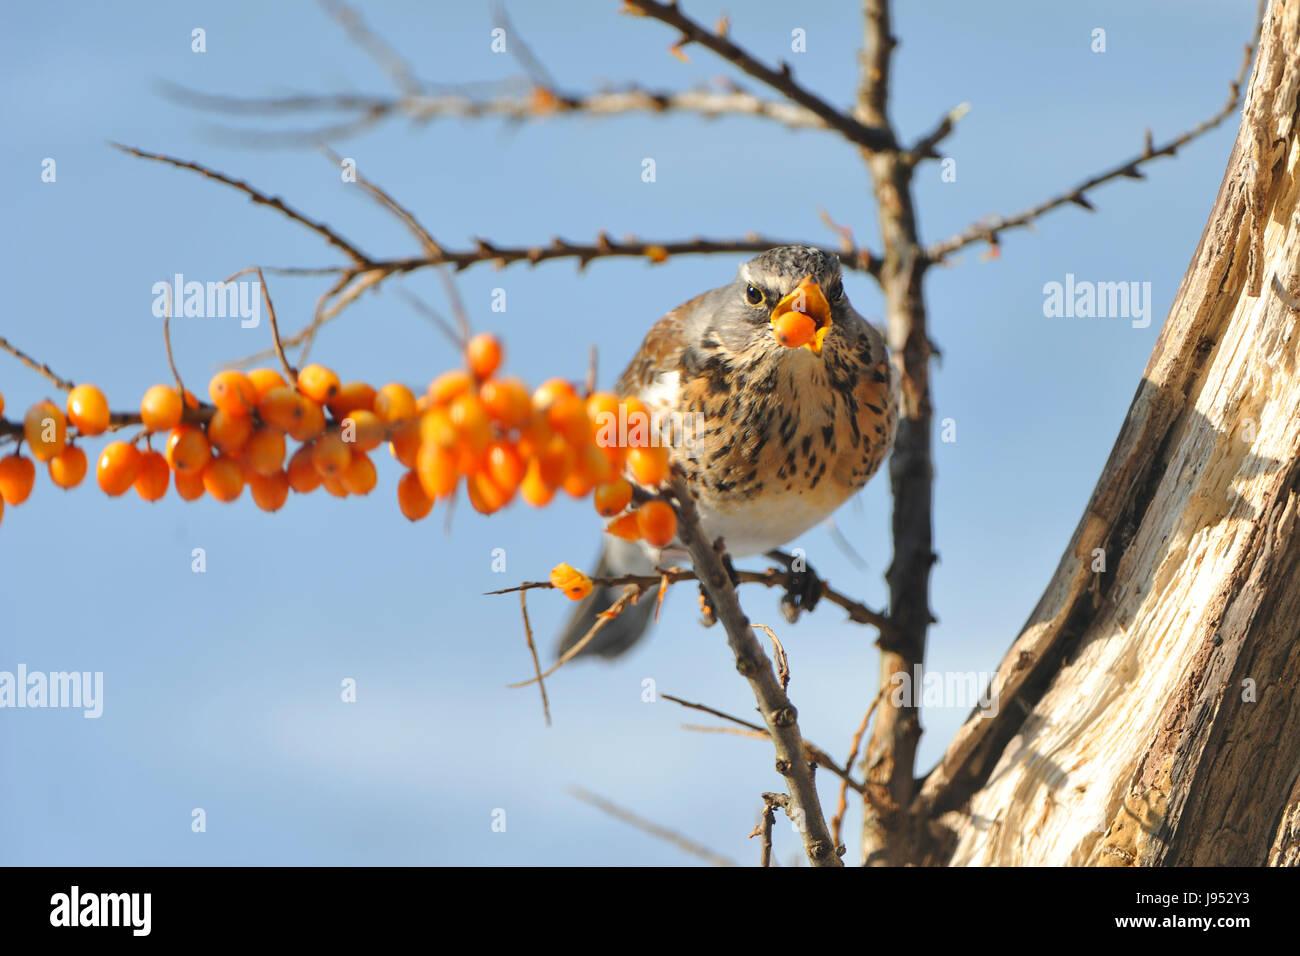 winter, winter, bird, snow, coke, cocaine, material, drug, anaesthetic, Stock Photo